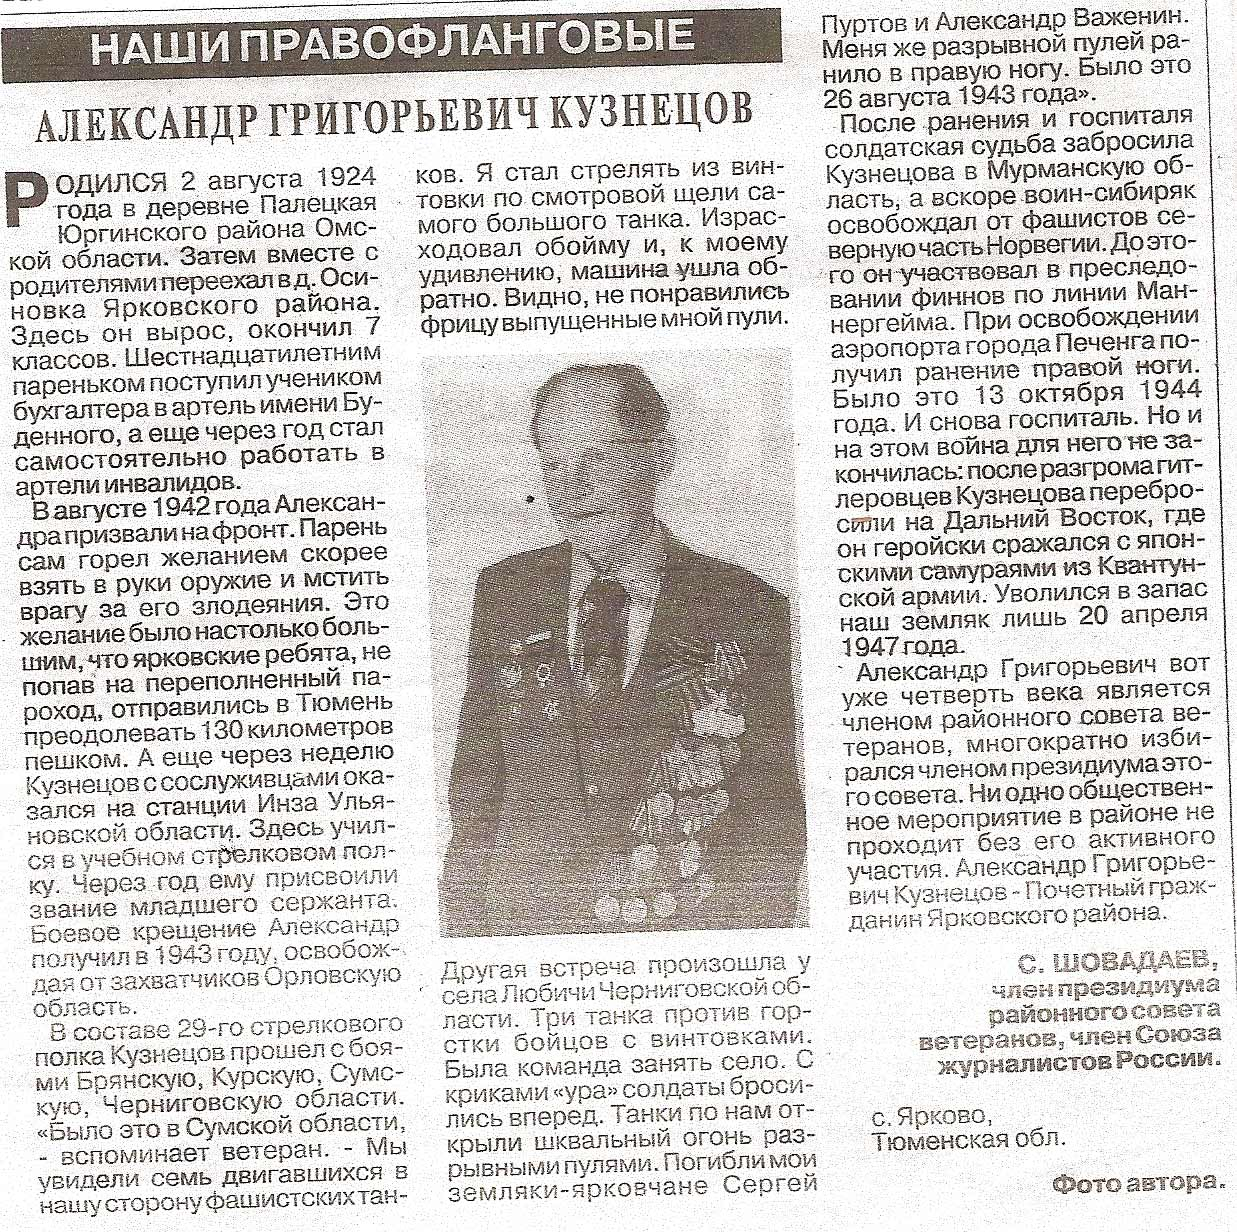 Олександр Григорович Кузнецов